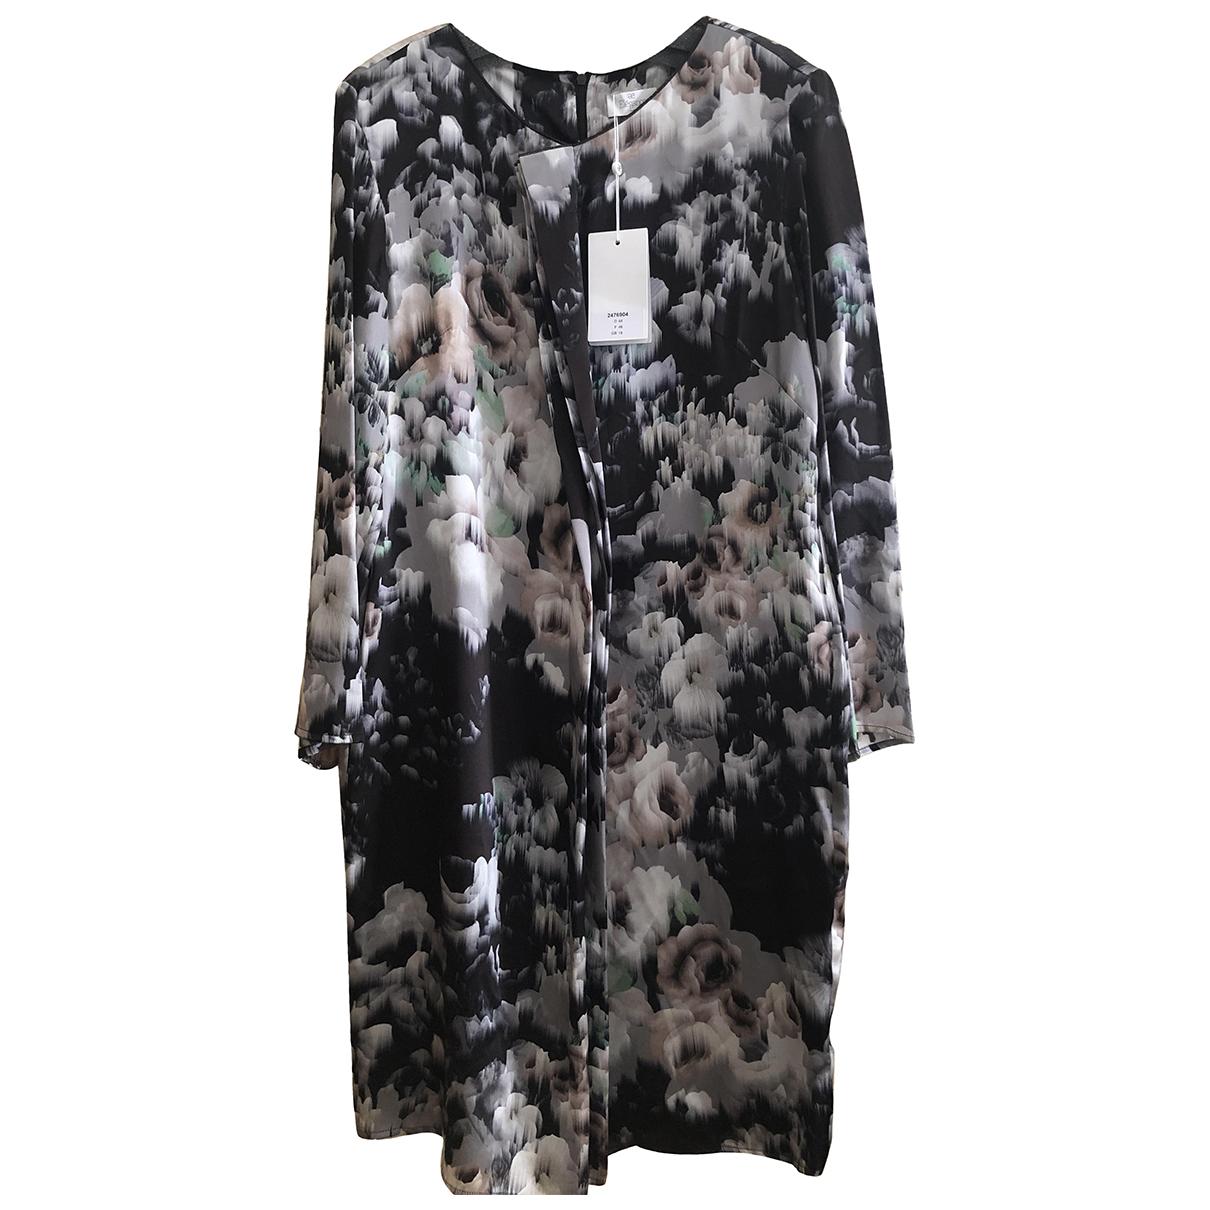 Elegance Paris \N Multicolour Silk dress for Women 46 FR